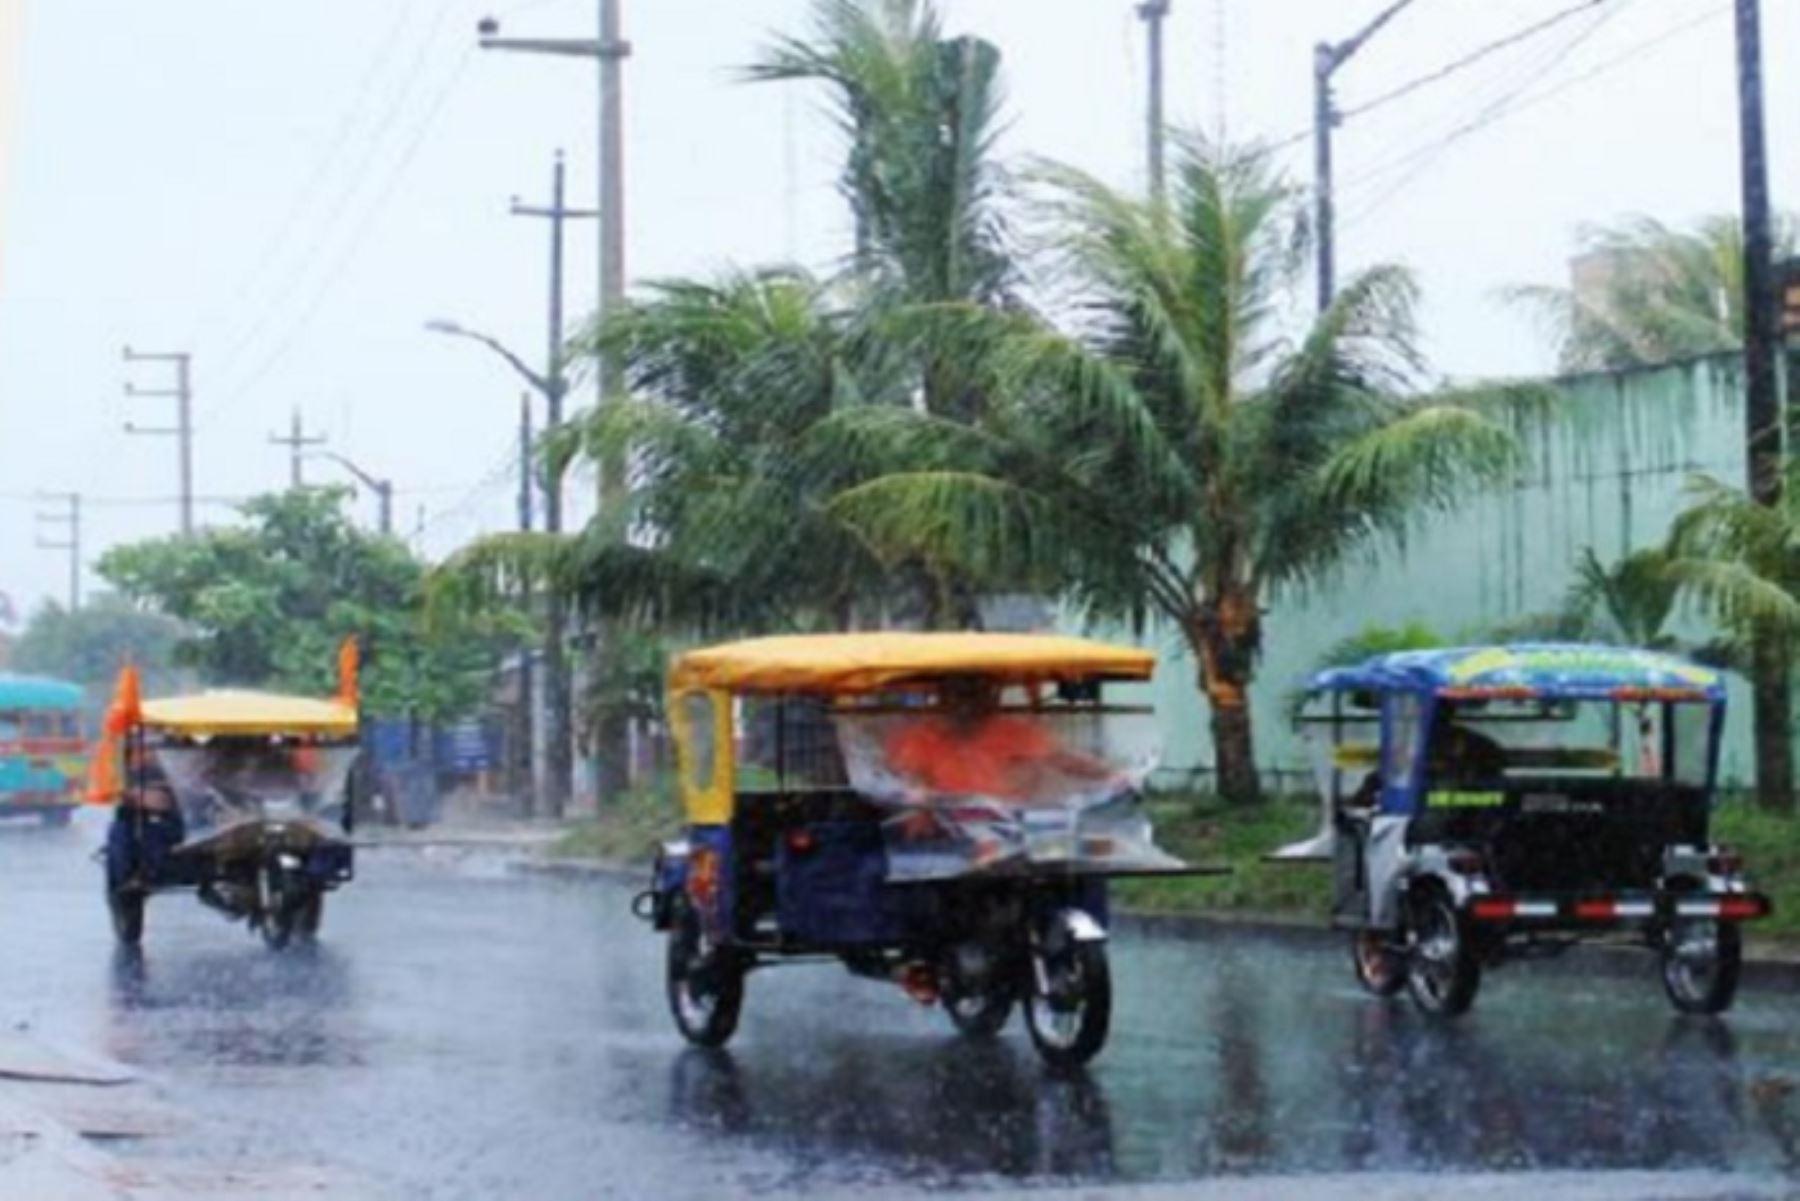 El Senamhi pronosticó precipitaciones pluviales de moderada a fuerte intensidad en la Selva. Foto: ANDINA/Difusión